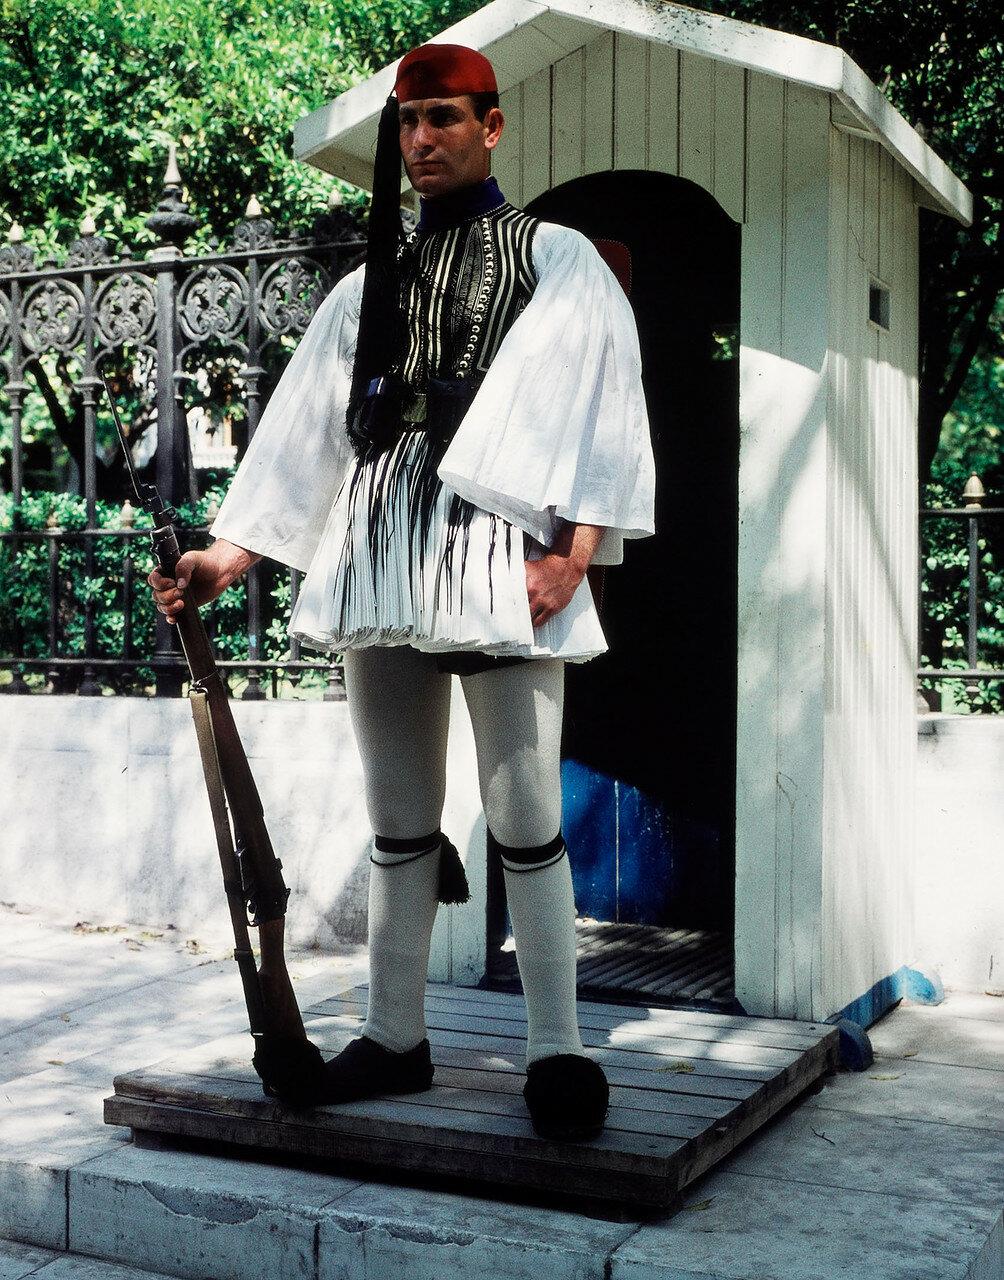 Evzonos, η βασιλική φρουρά